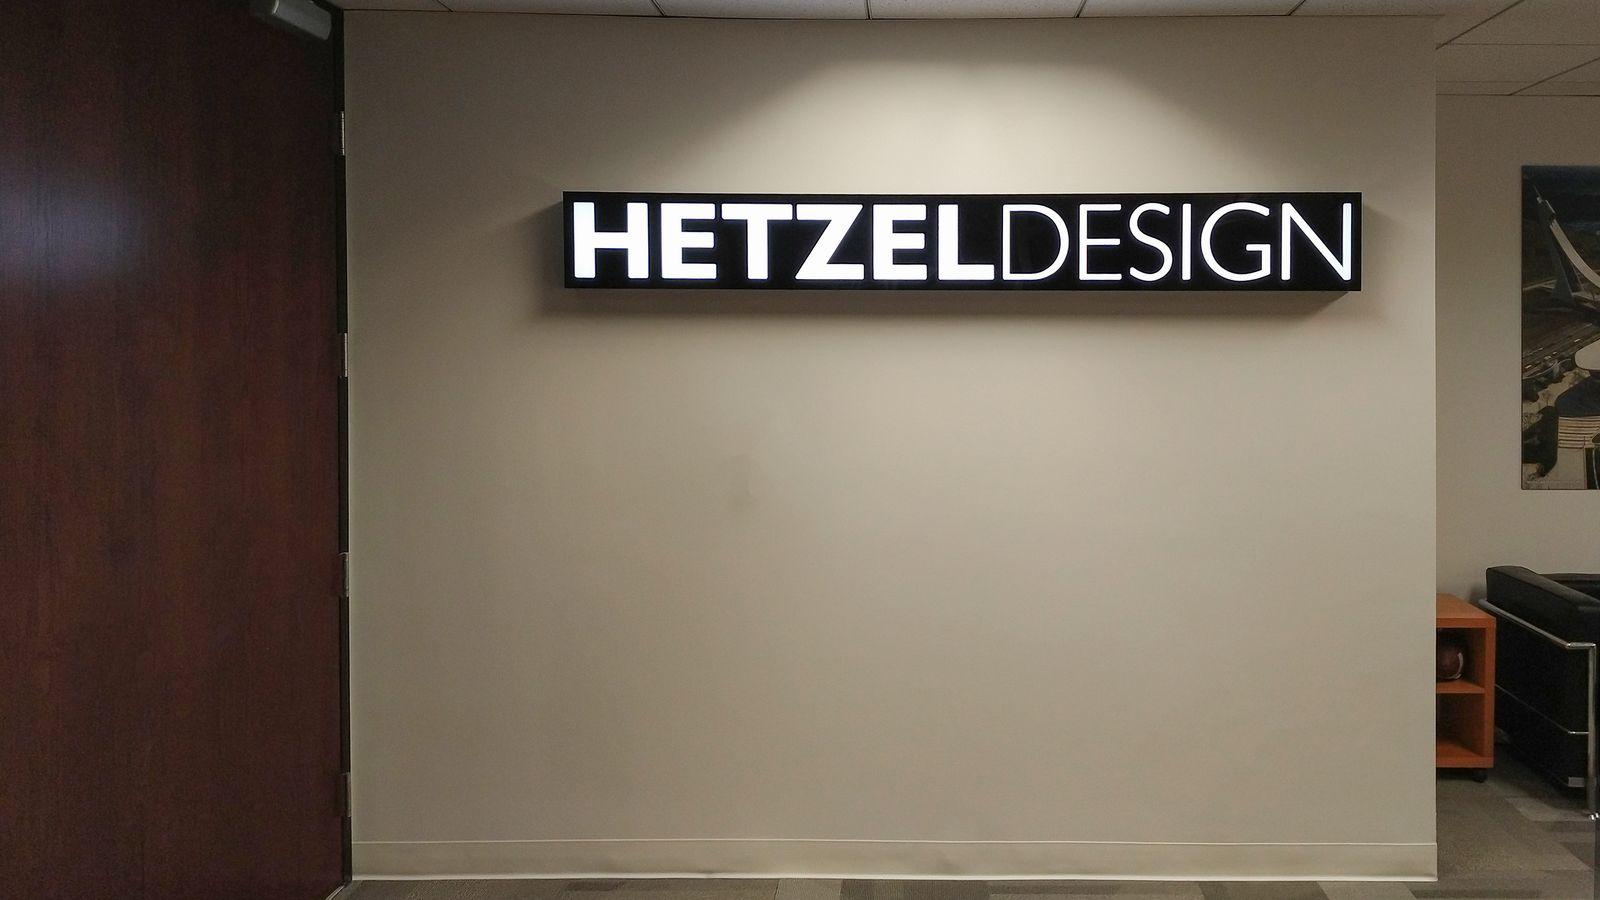 Hetzel Design lobby sign